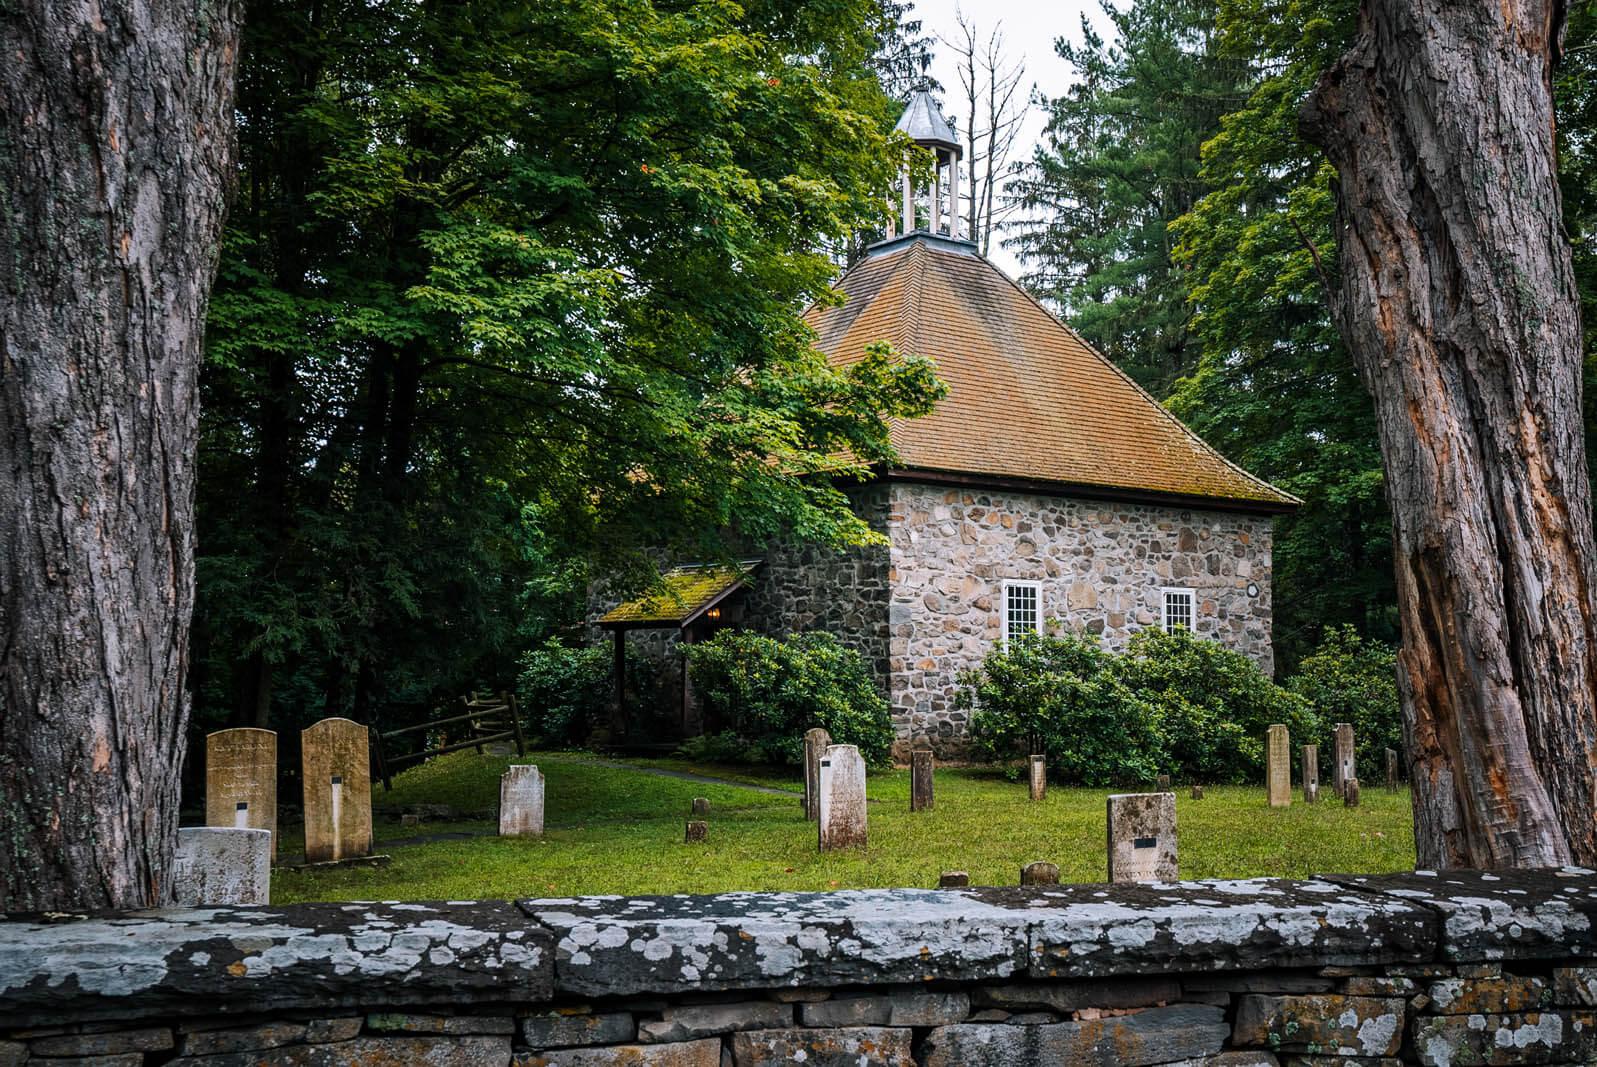 Huguenot Historic homes in New Paltz New York in the Catskills